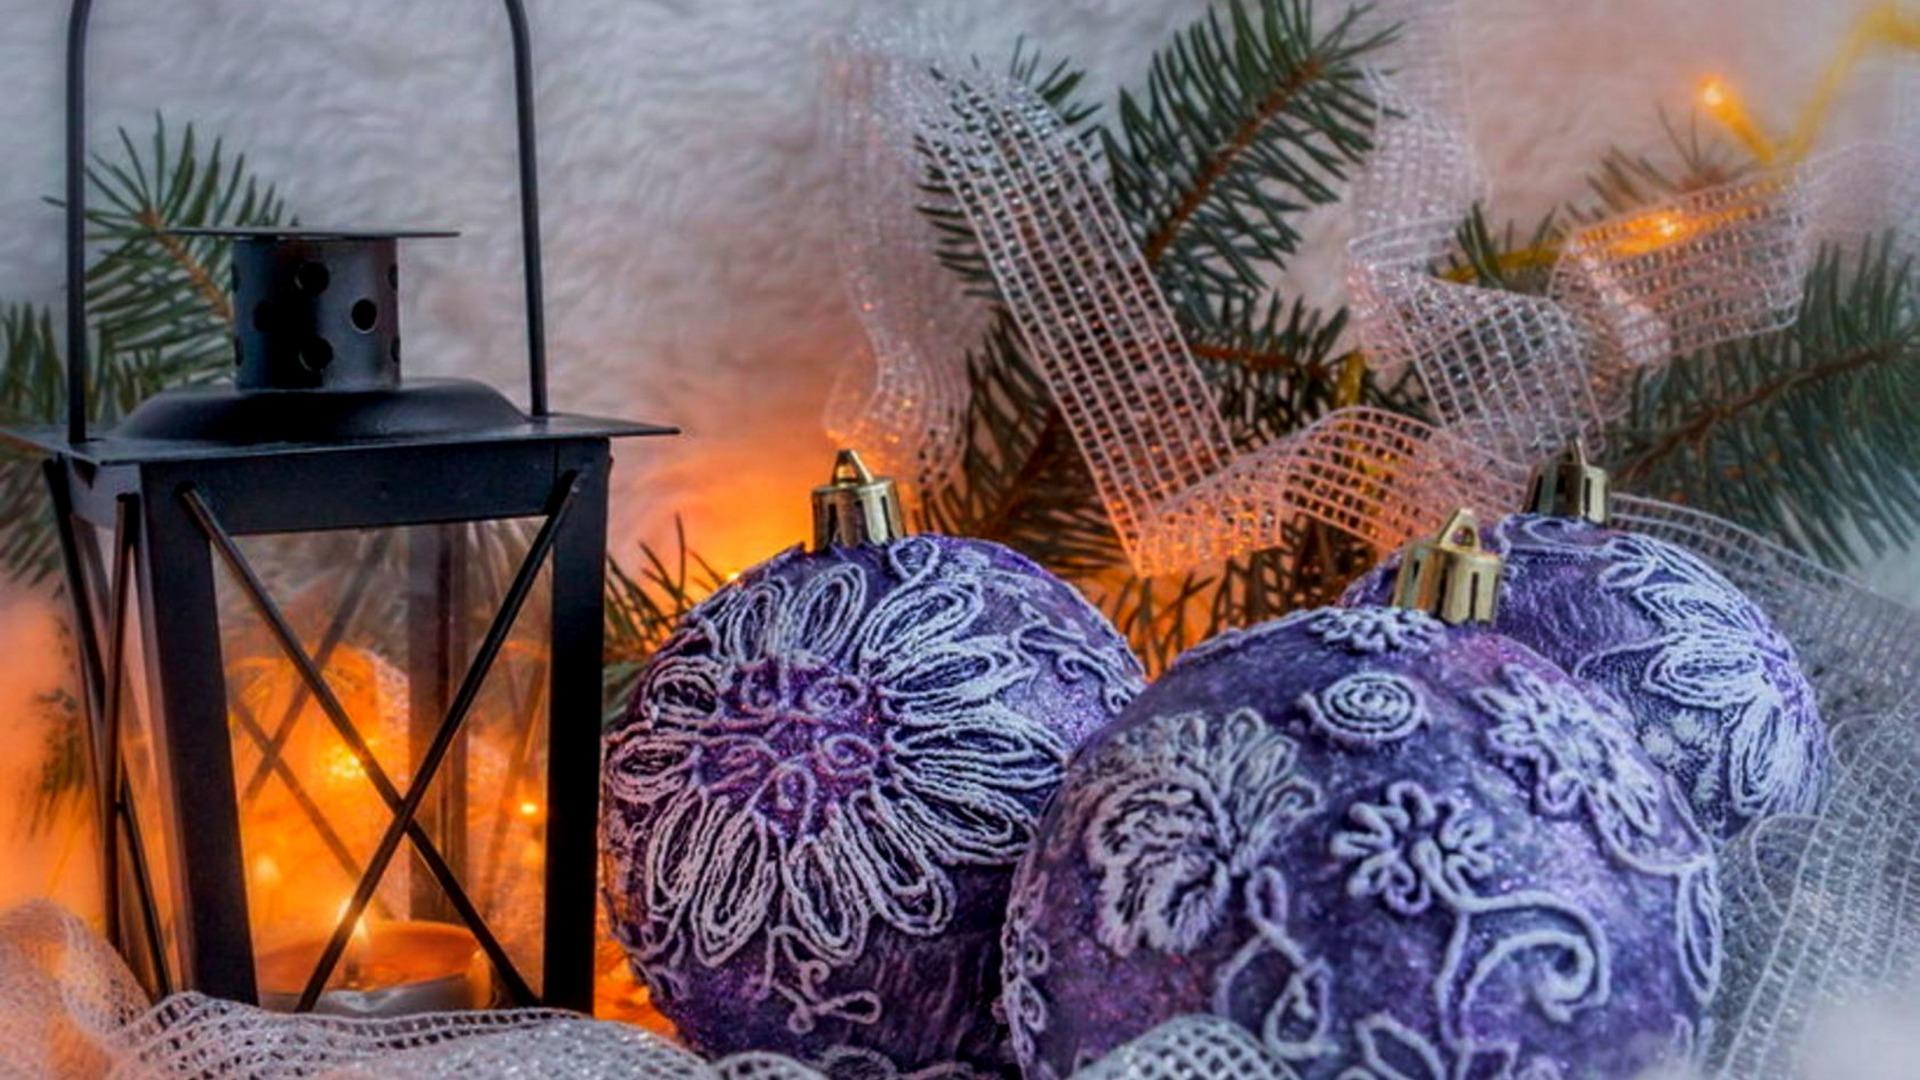 Download-snow-balls-tree-new-year-candle-lantern-Christmas-balls-bumps-tree-Chri-wallpaper-wp3804821